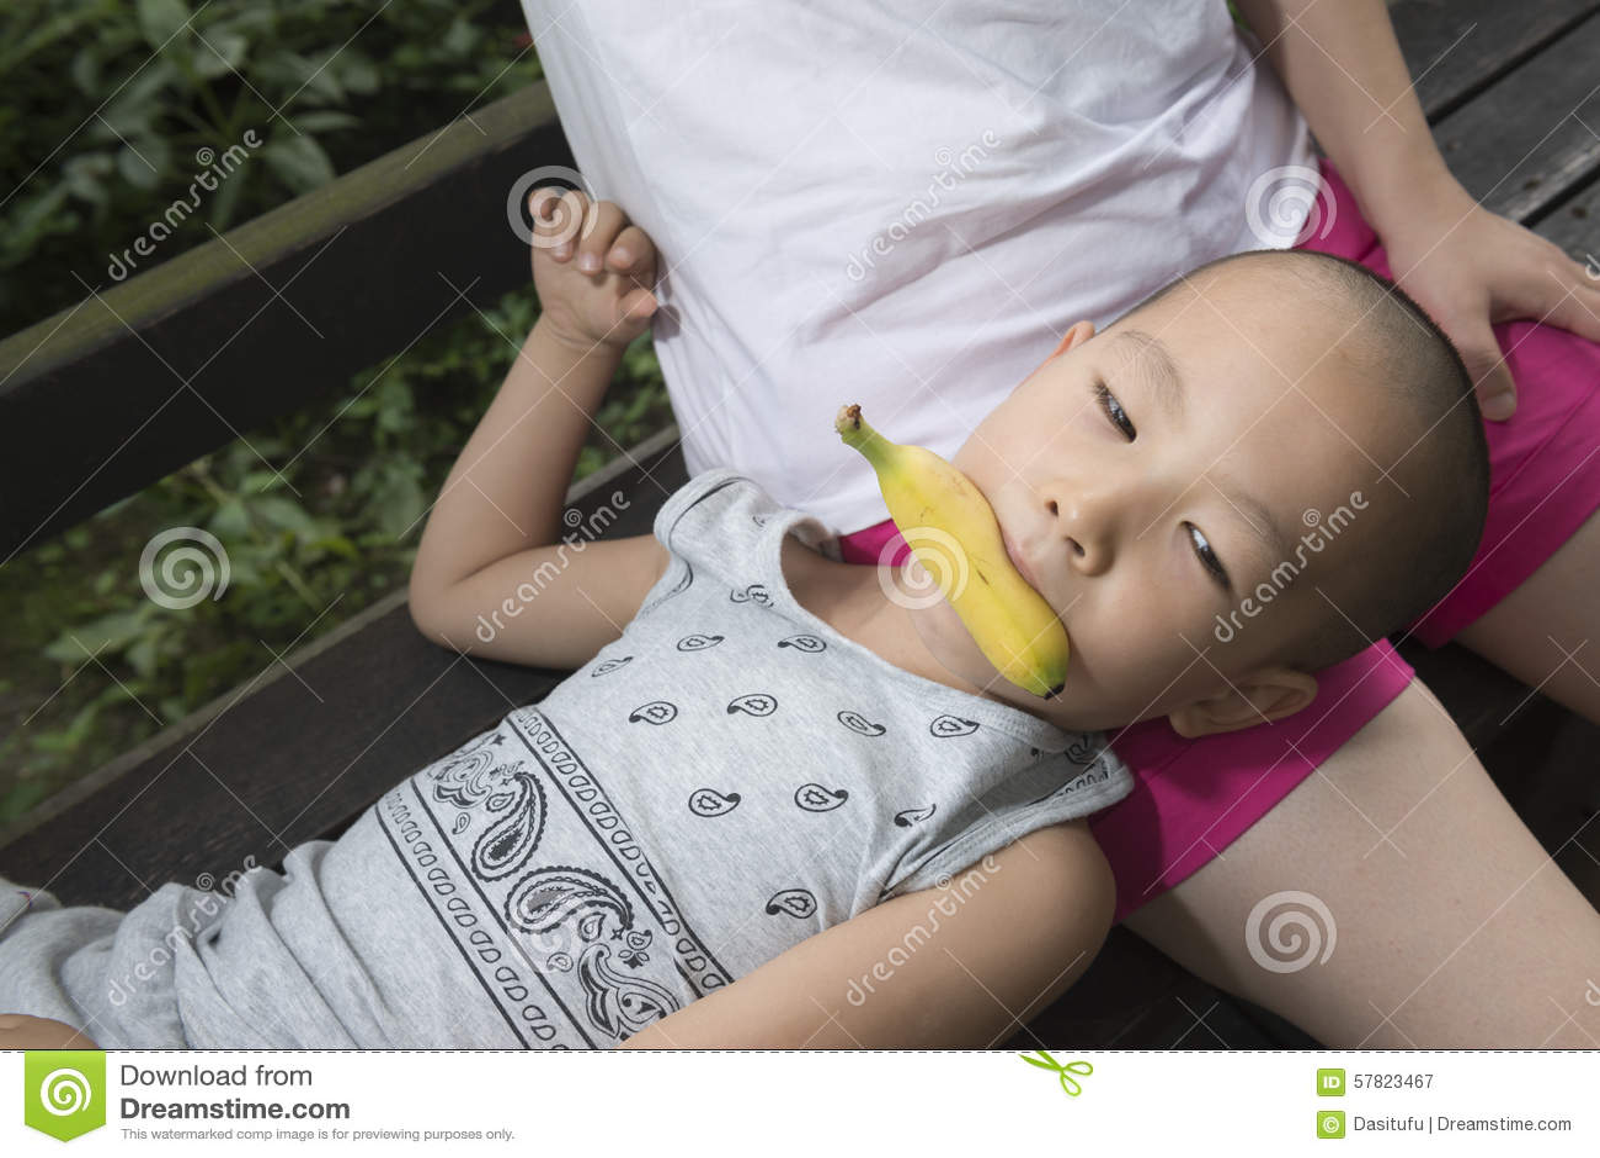 Sleeping cum in mouth